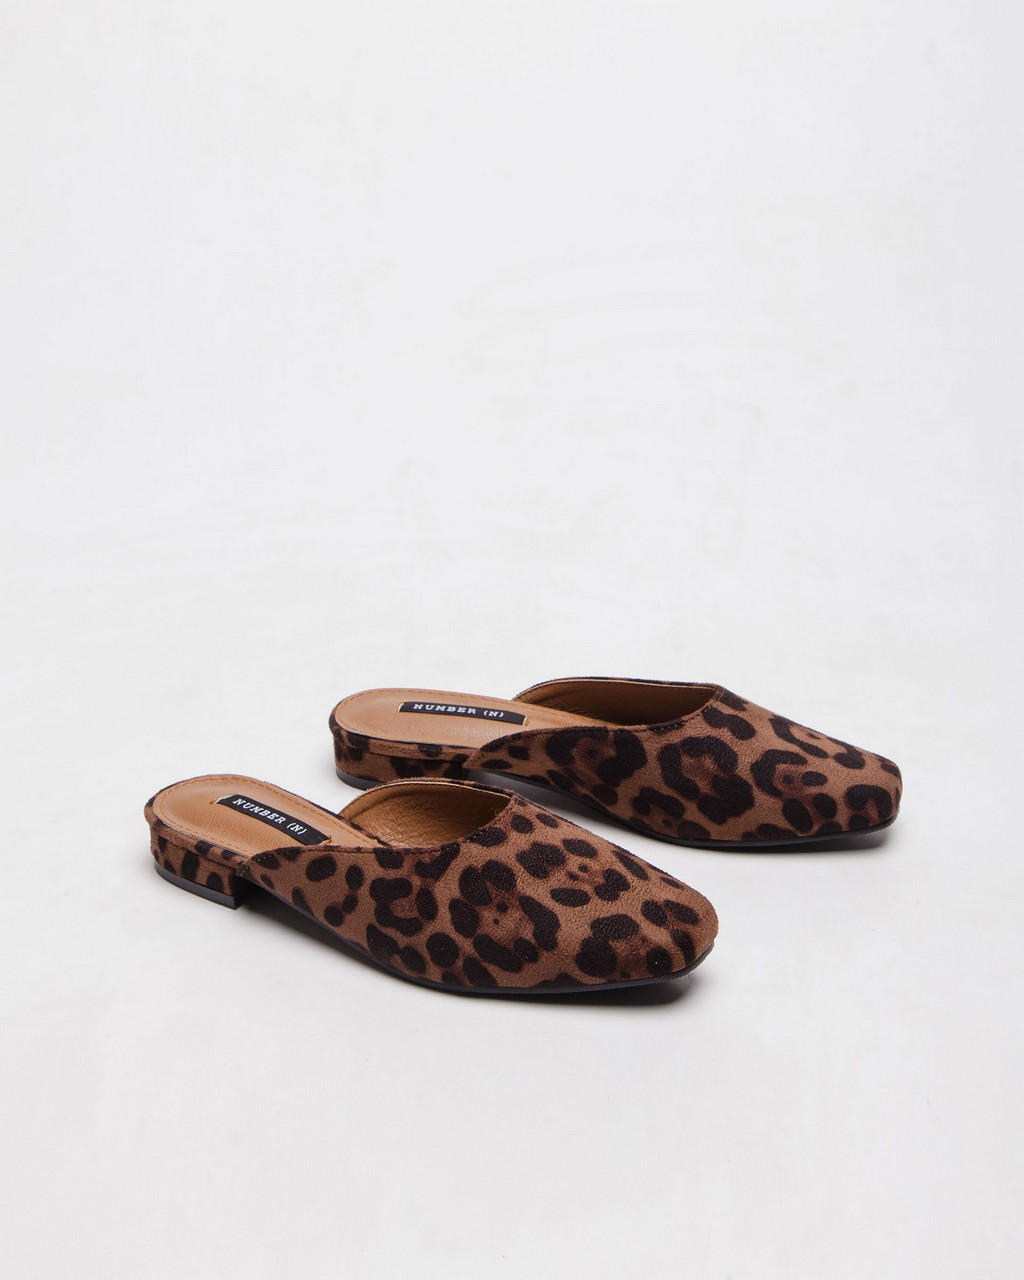 Tagtraume Marigold-05 - Leopard(레오파드)